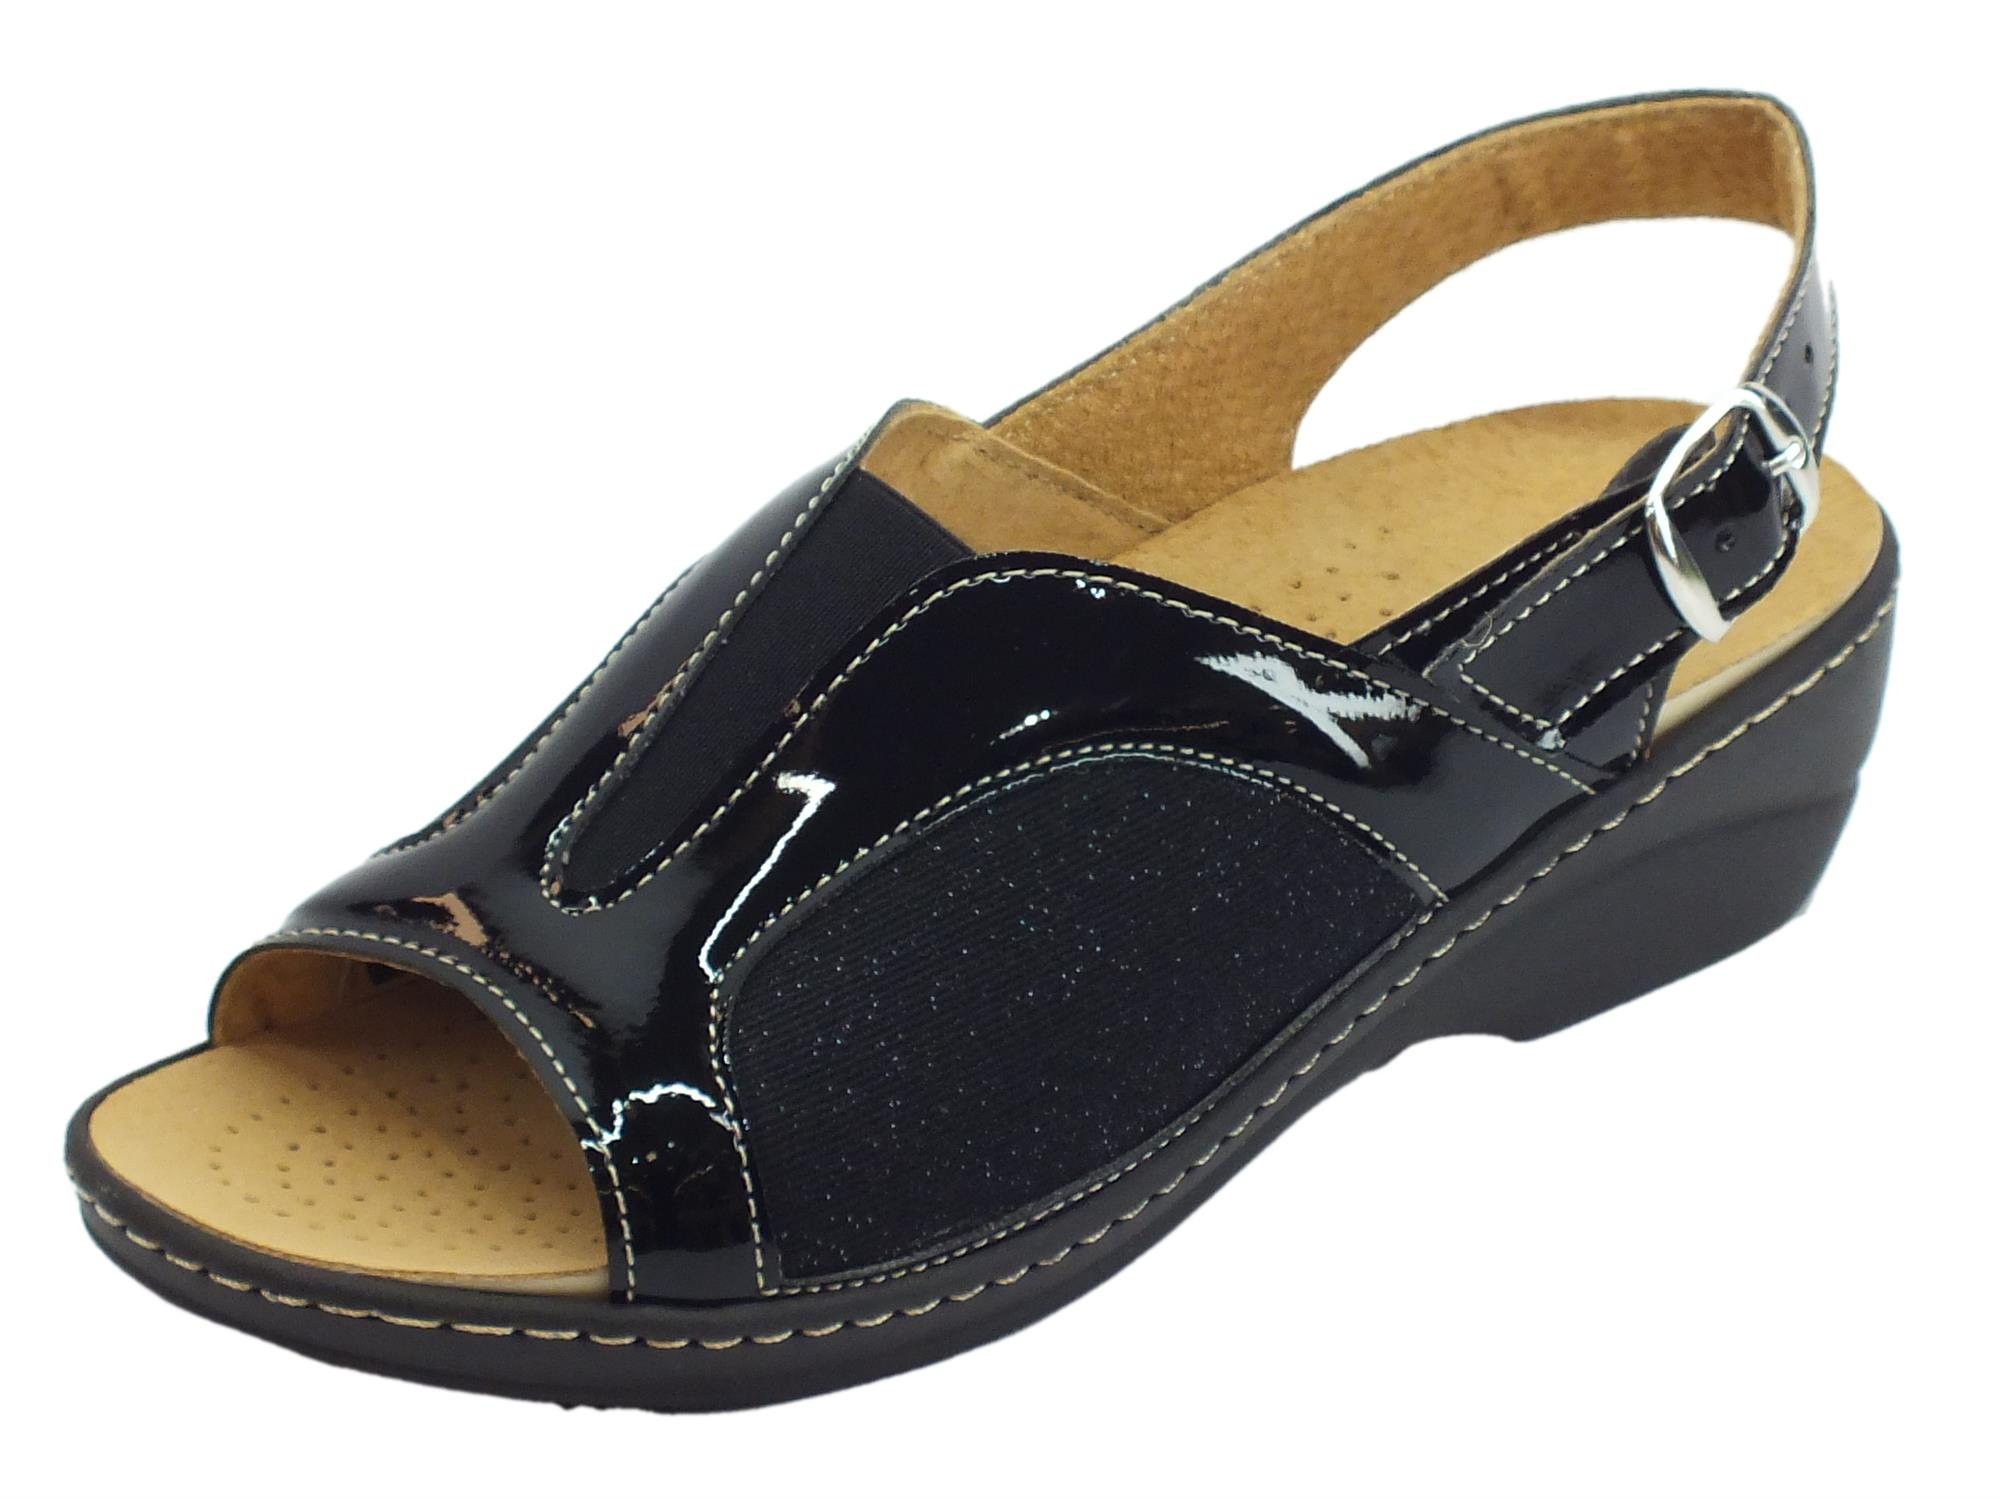 5cdf51bdc8ab5 Cinzia Soft sandali linea comoda vernice tessuto - Vitiello Calzature